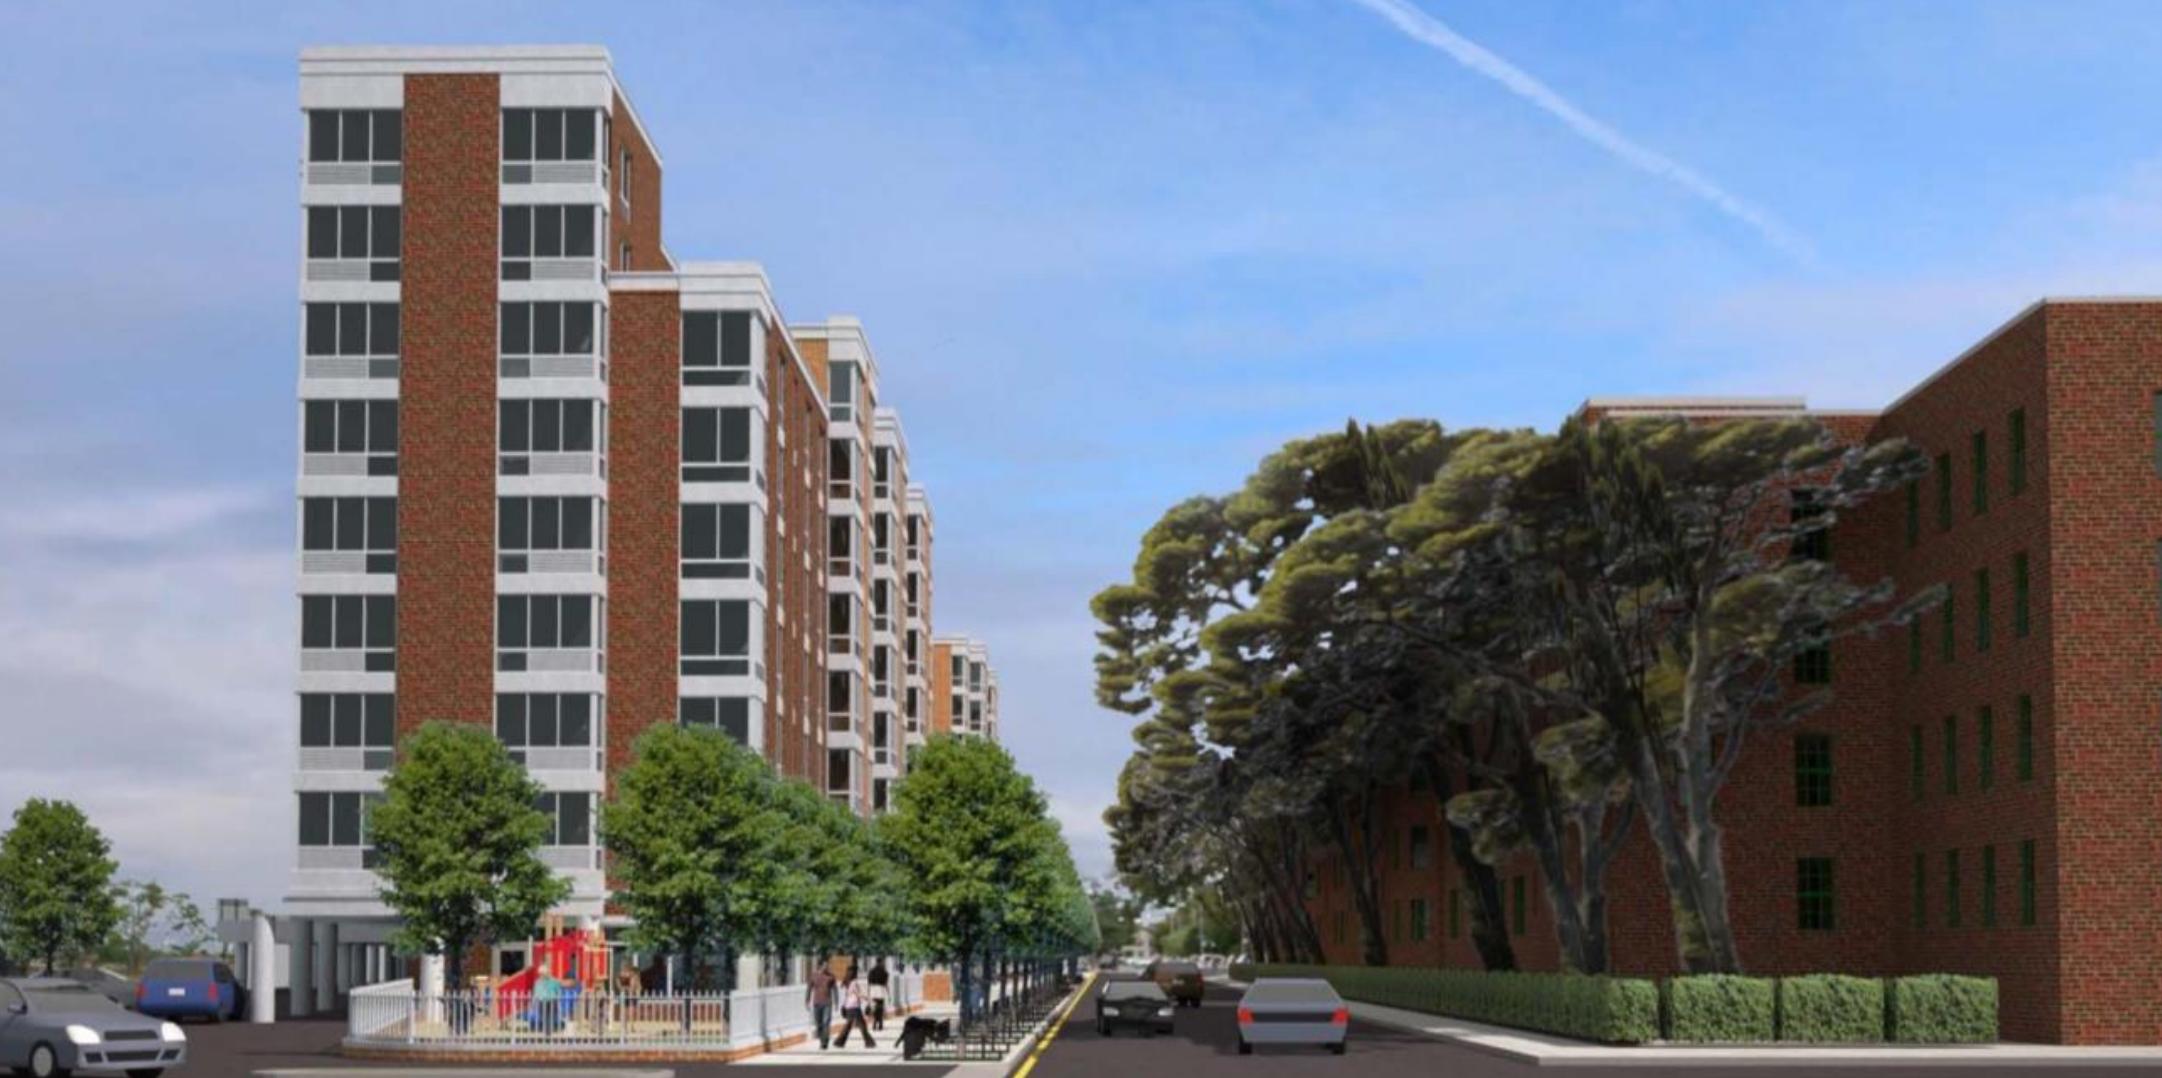 Public Approvals Begin for Sunnyside Affordable Housing at